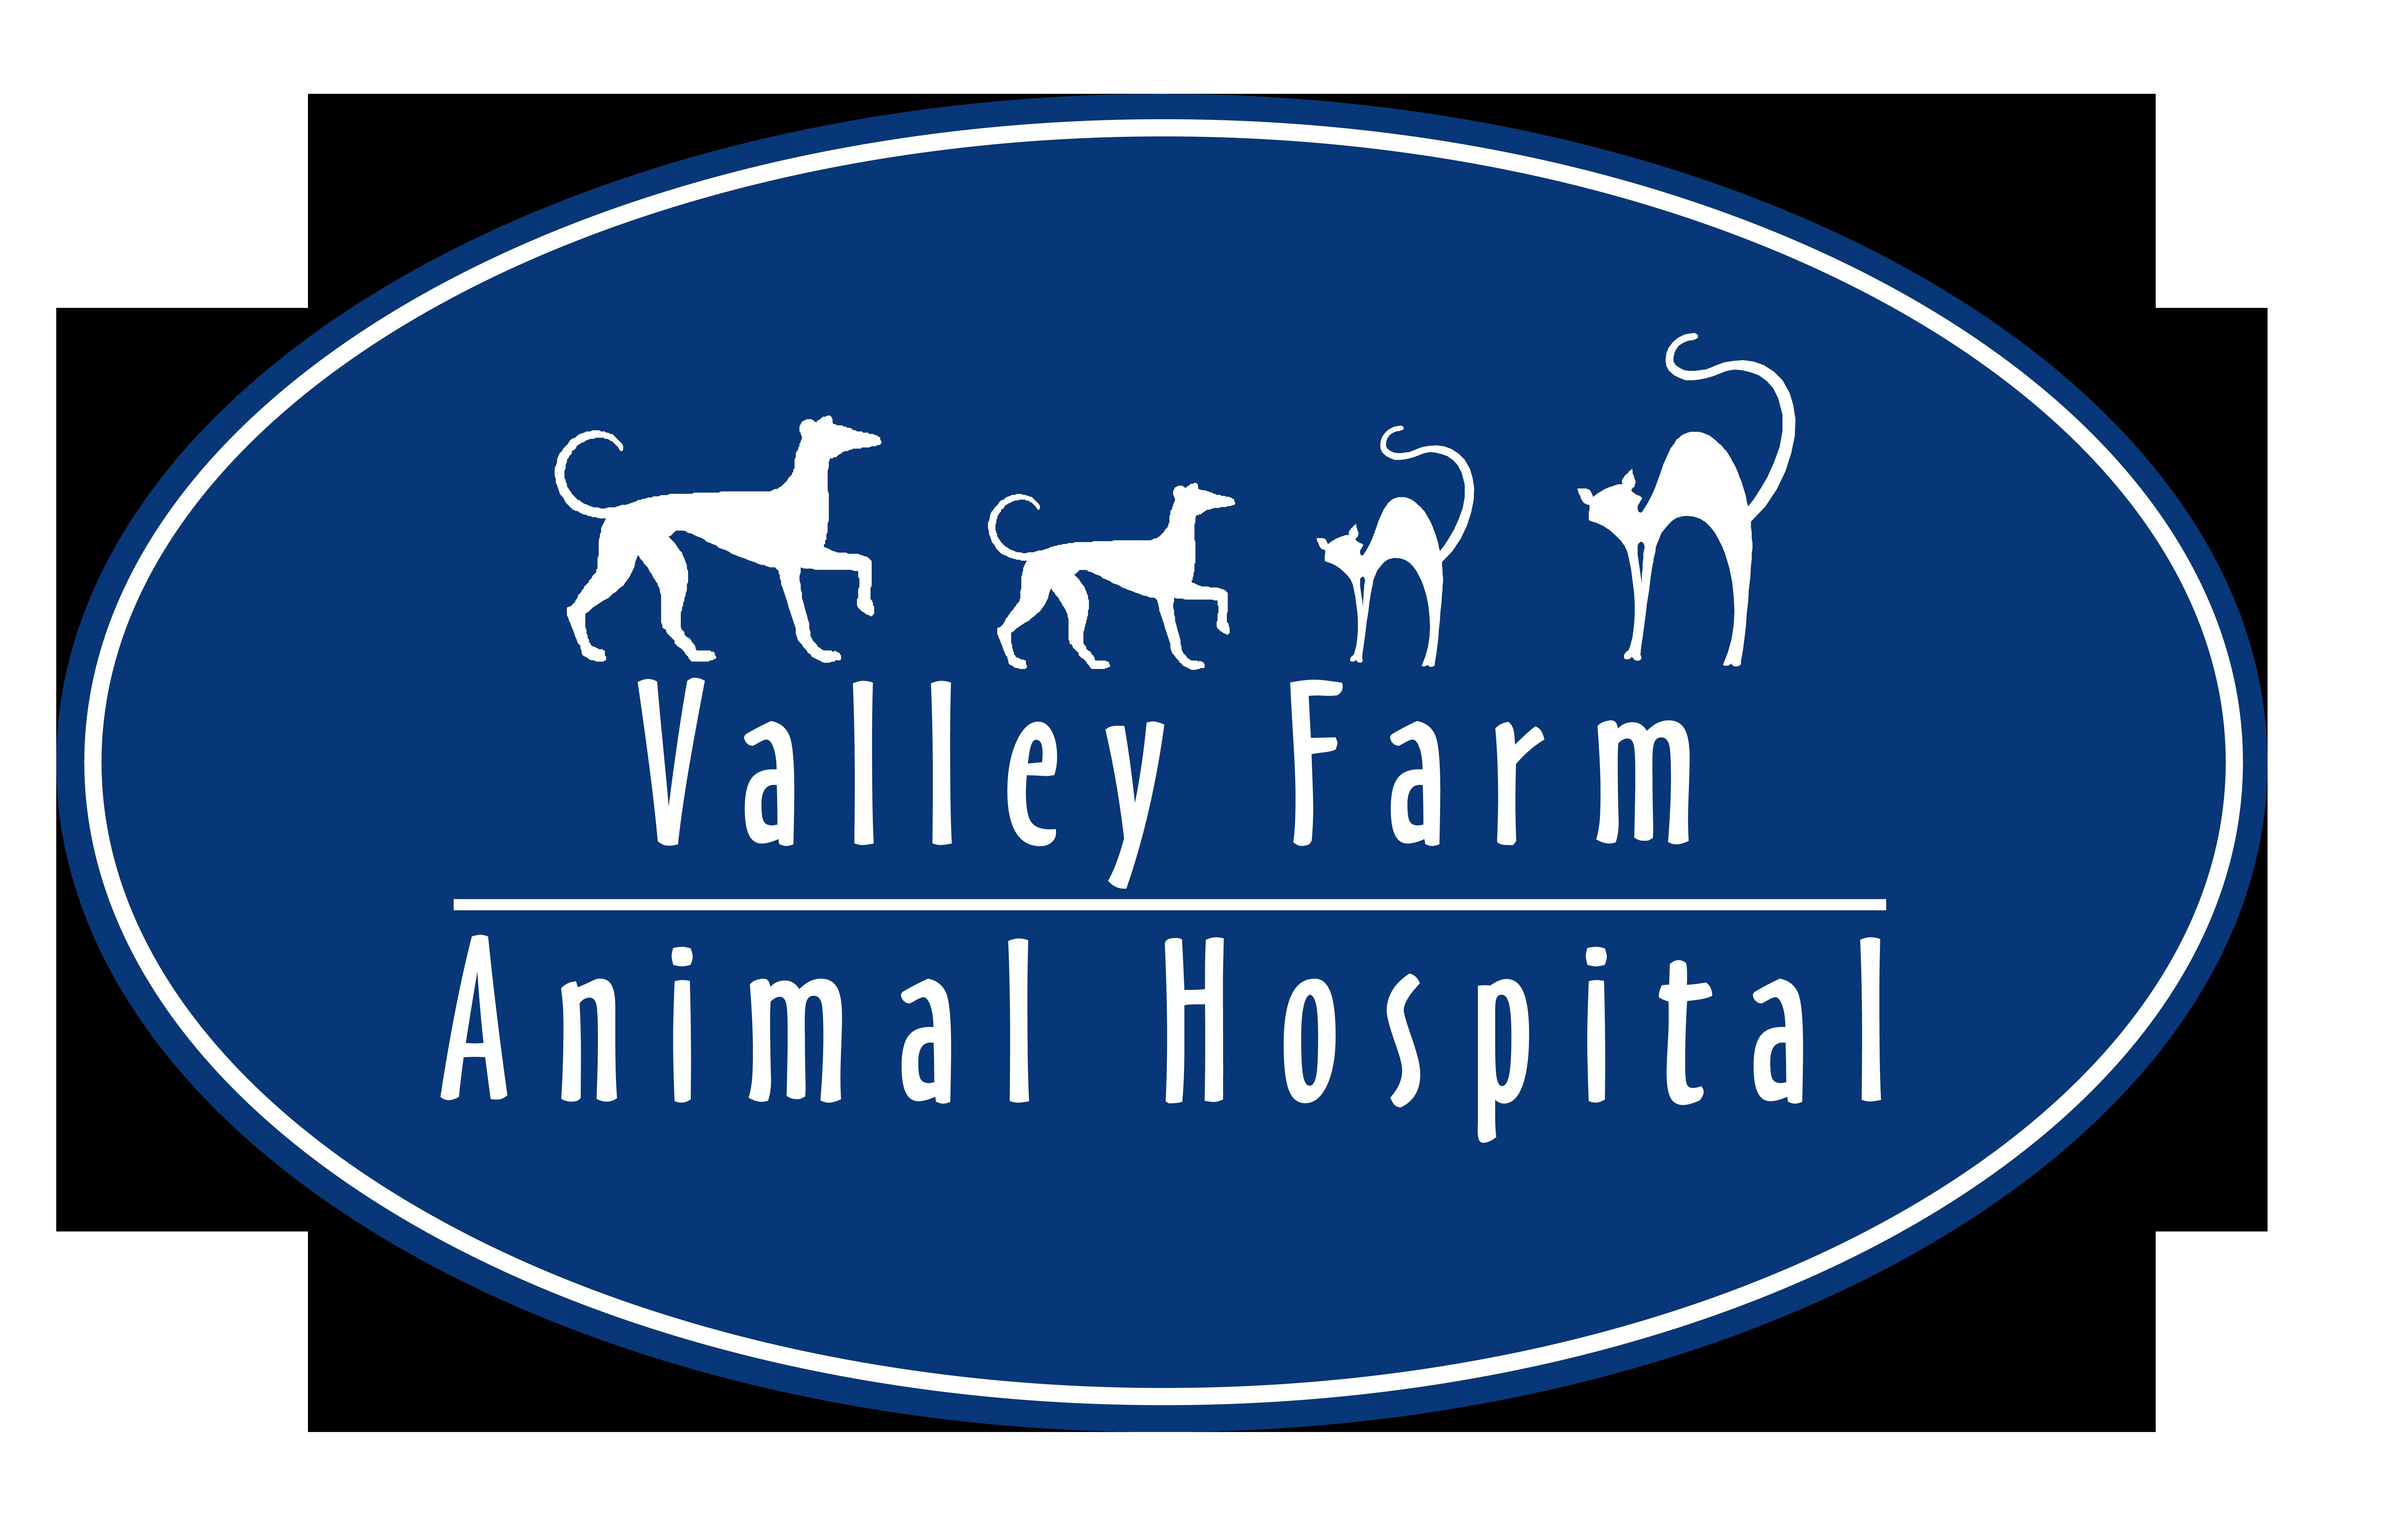 Valley Farm Animal Hospital (Pty) Ltd logo